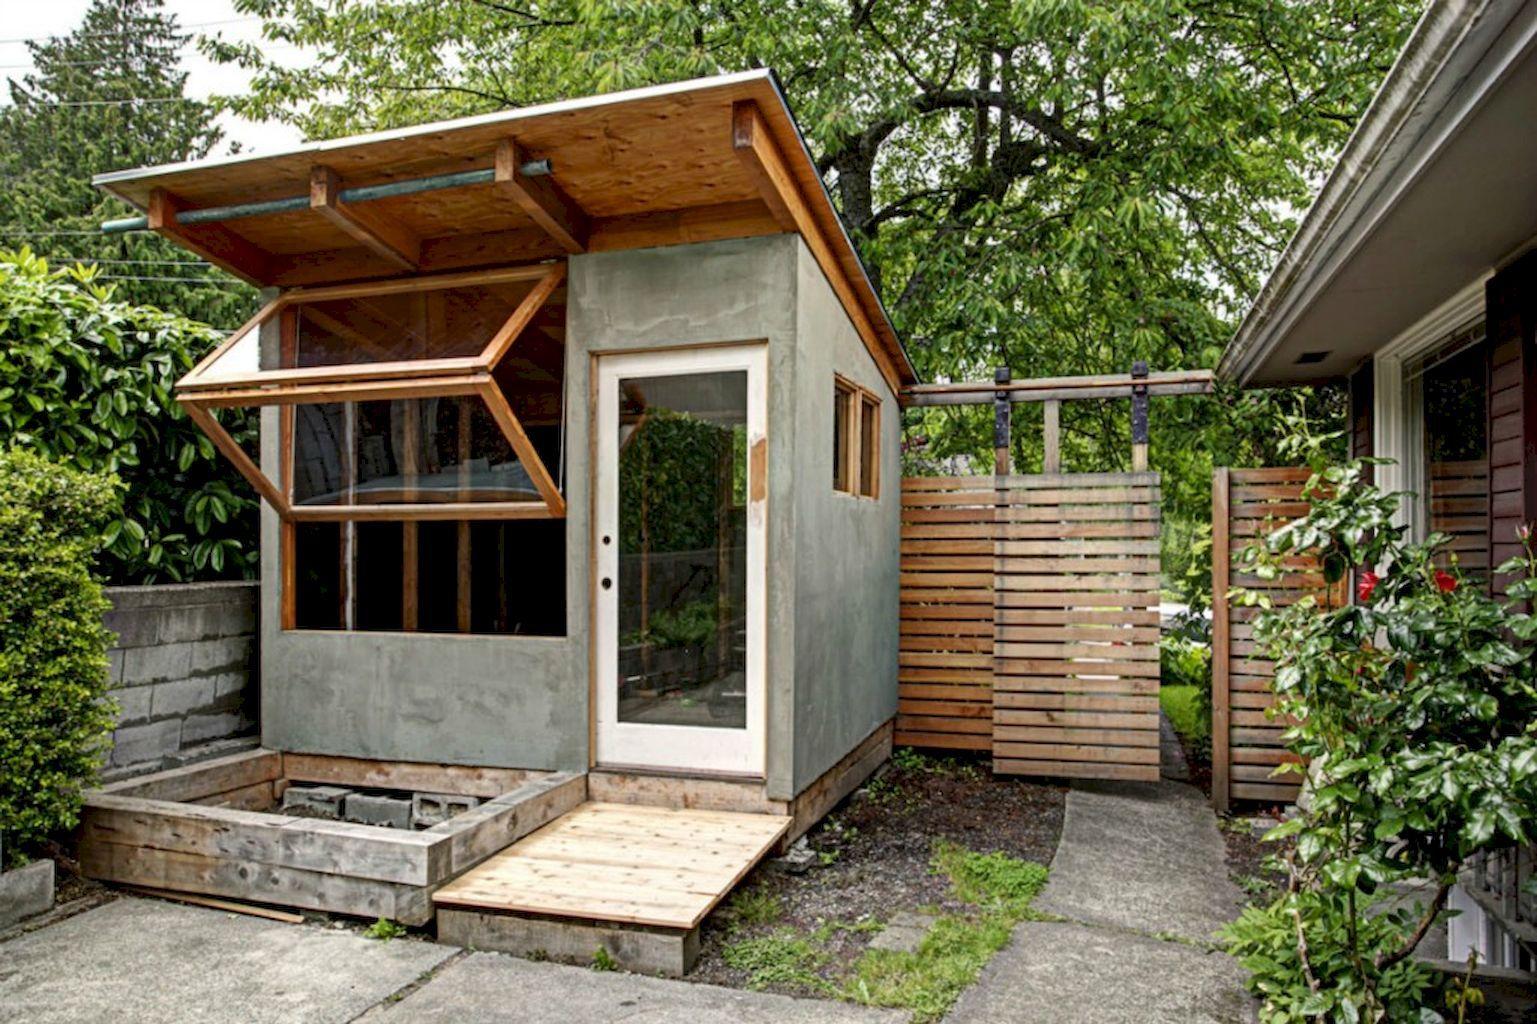 55 Cool Diy Backyard Studio Shed Remodel Design Decor Ideas Decorapartment Backyard Studio Backyard Sheds Shed Design Modern backyard shed ideas